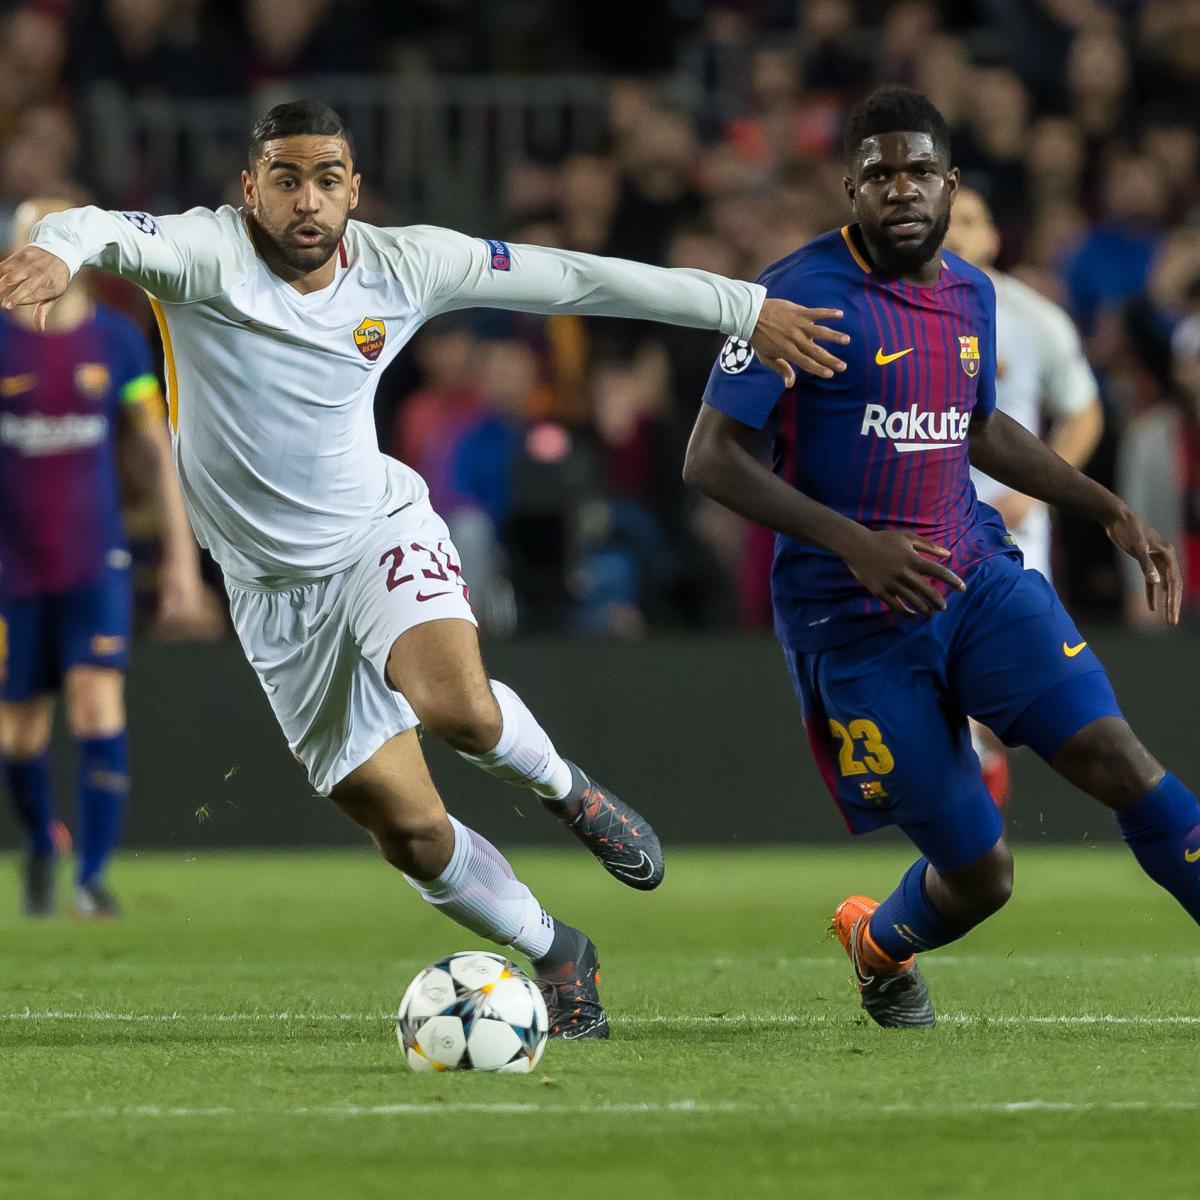 Champions League Roma Vs Barcelona: Roma Vs. Barcelona: Preview, Live Stream, TV Info For UCL